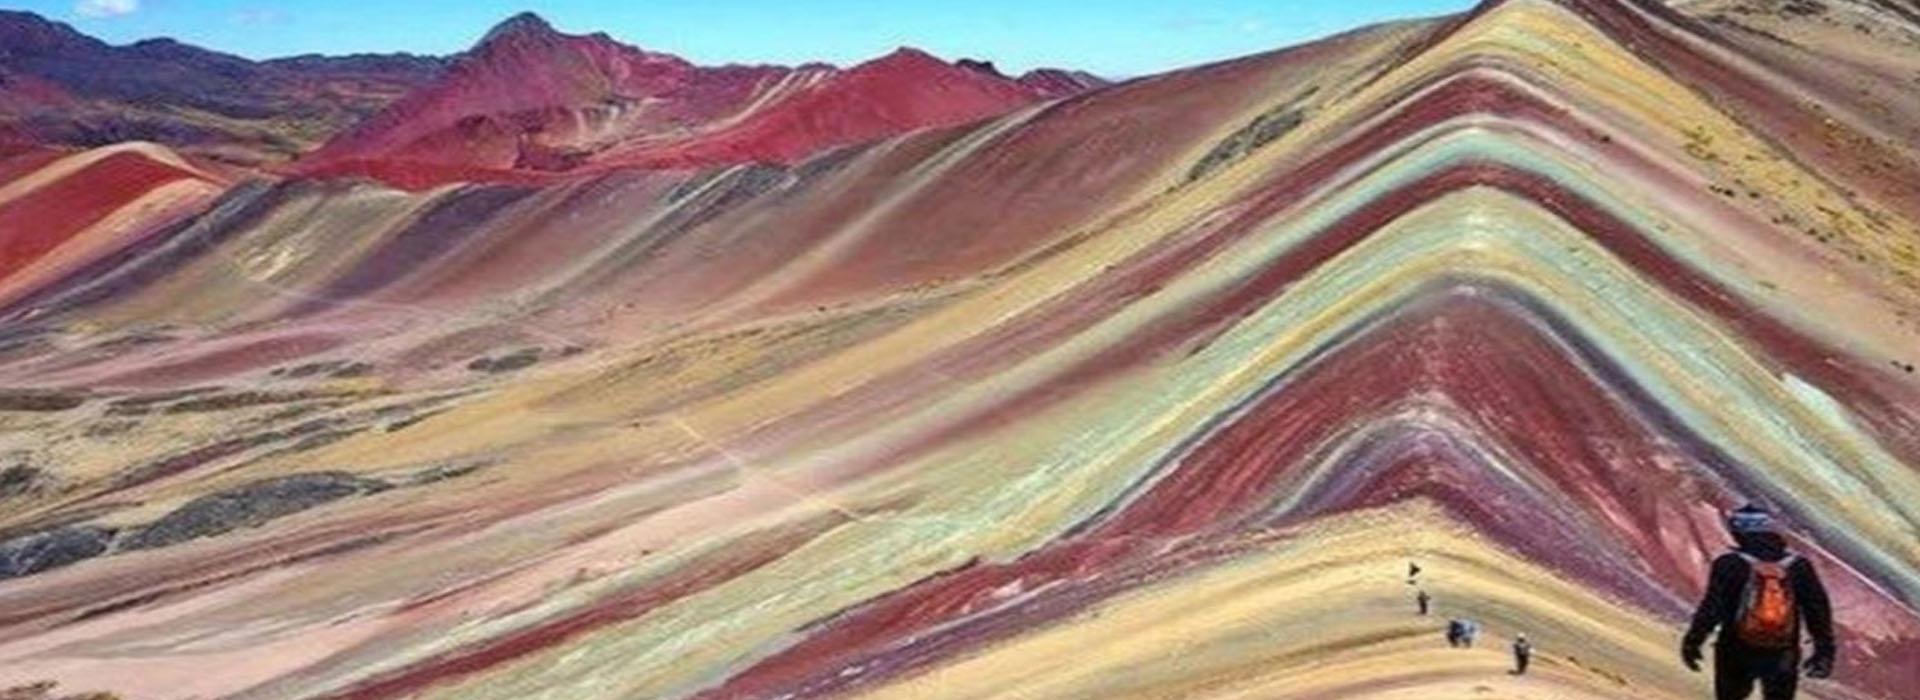 The Rainbow Mountain 1 day